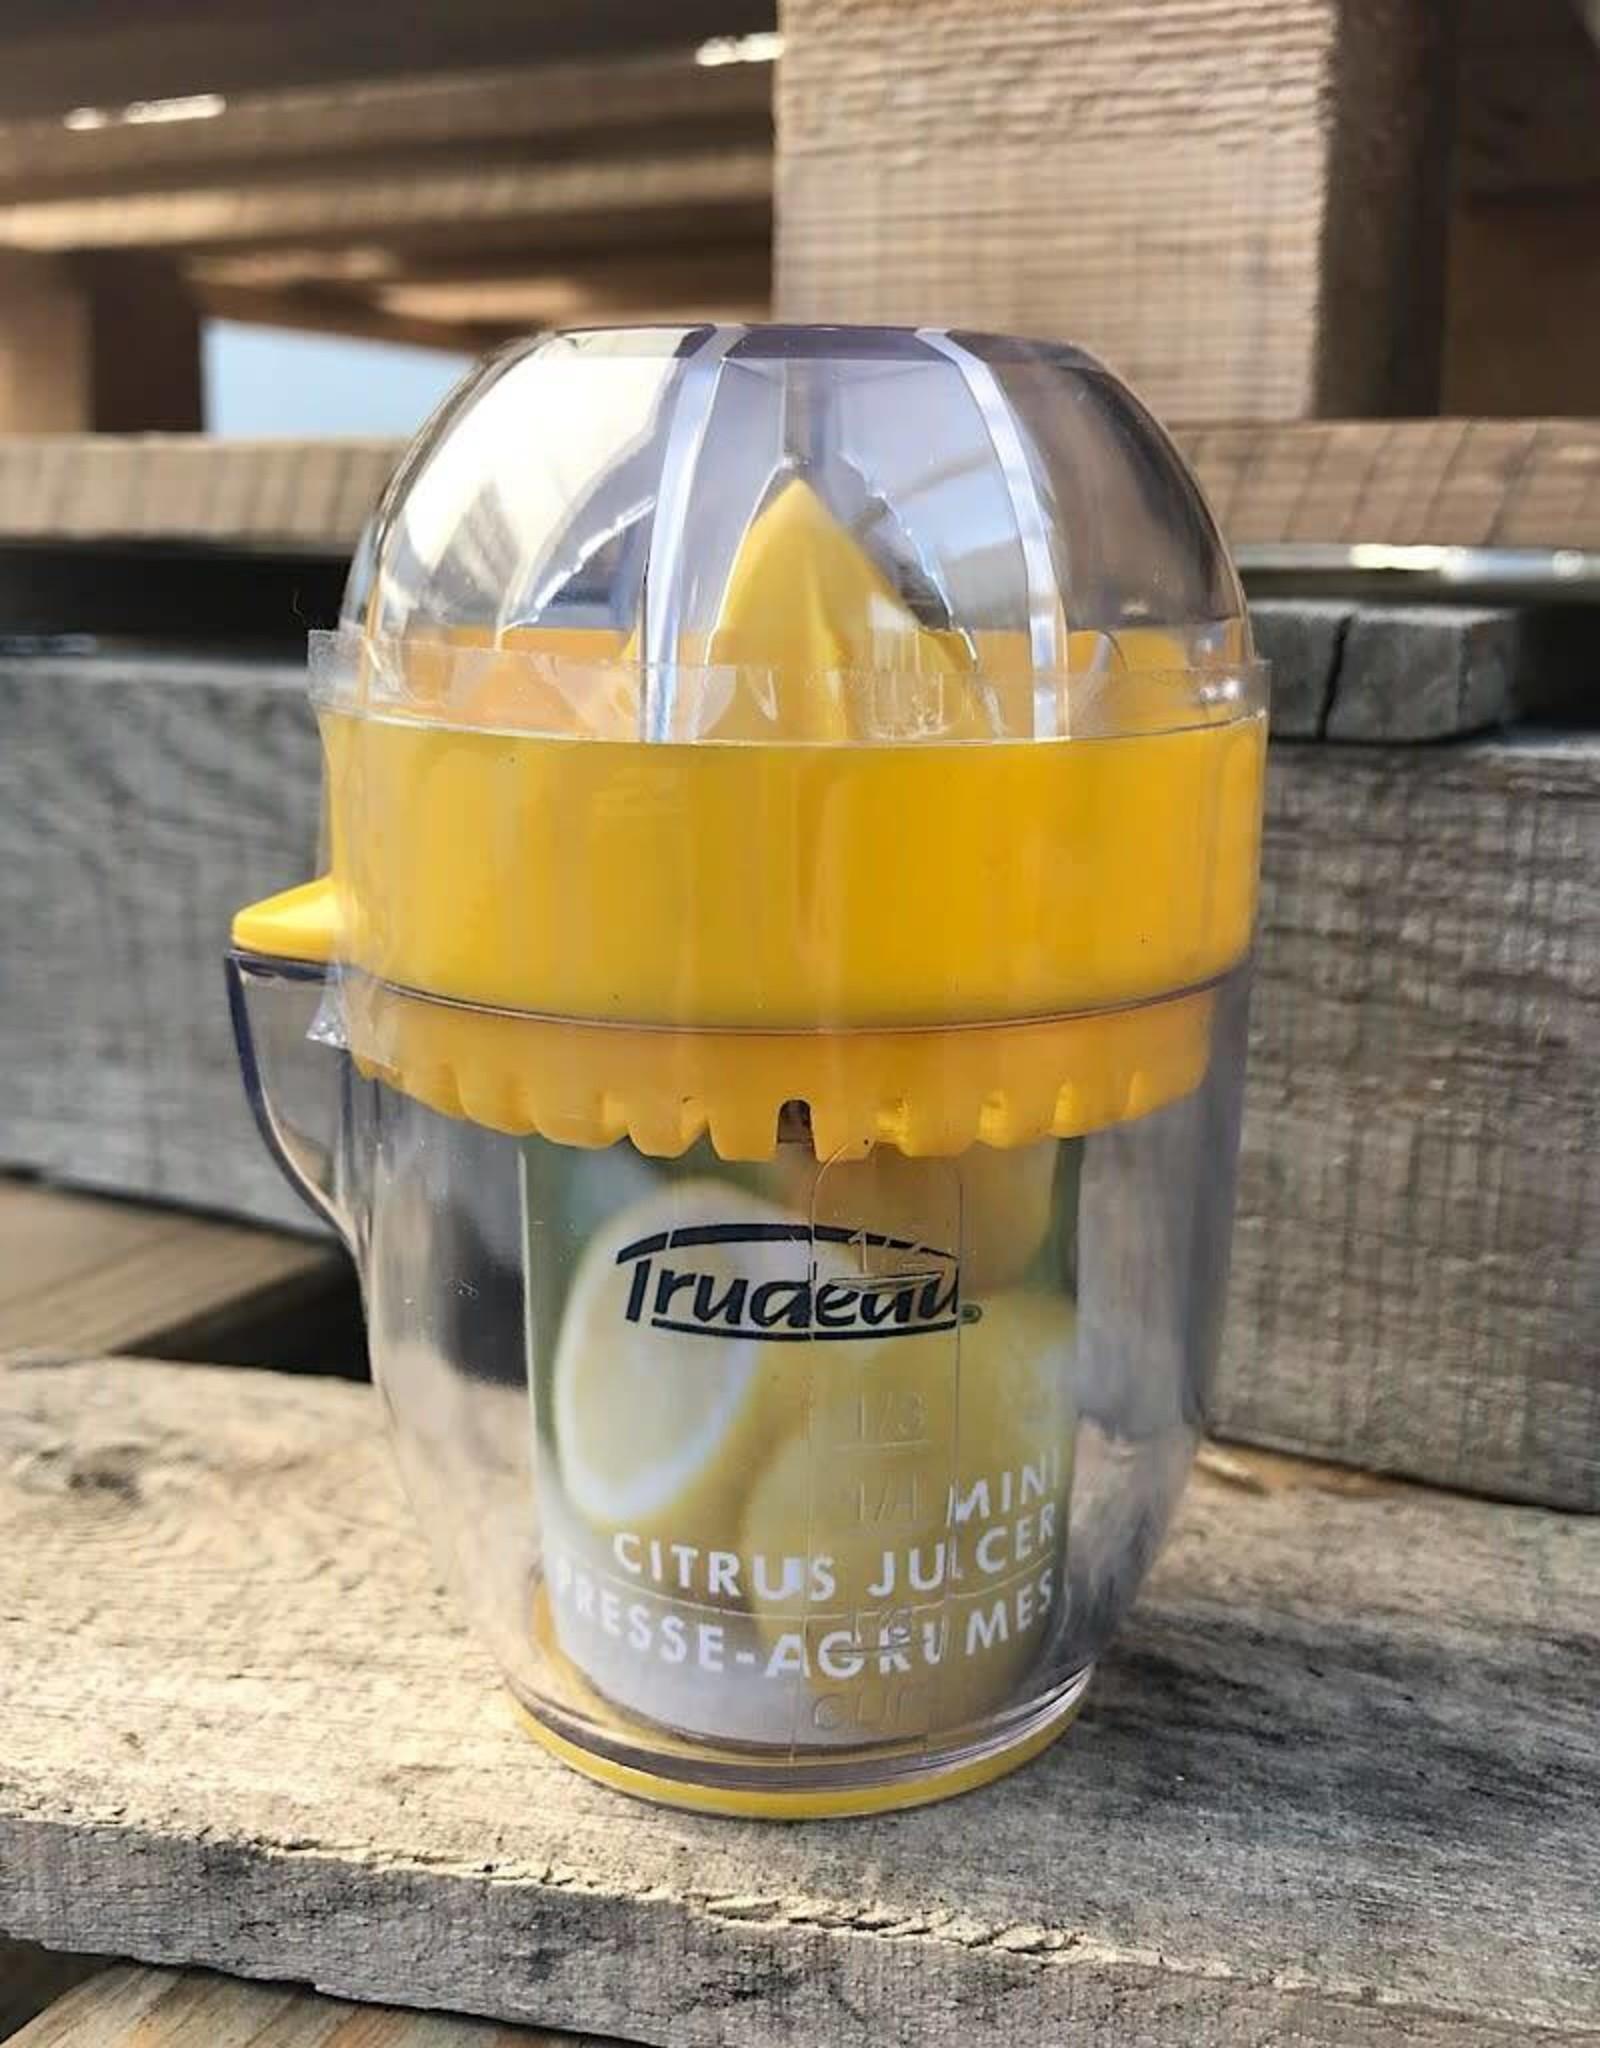 Trudeau 09911067 mini citrus juicer